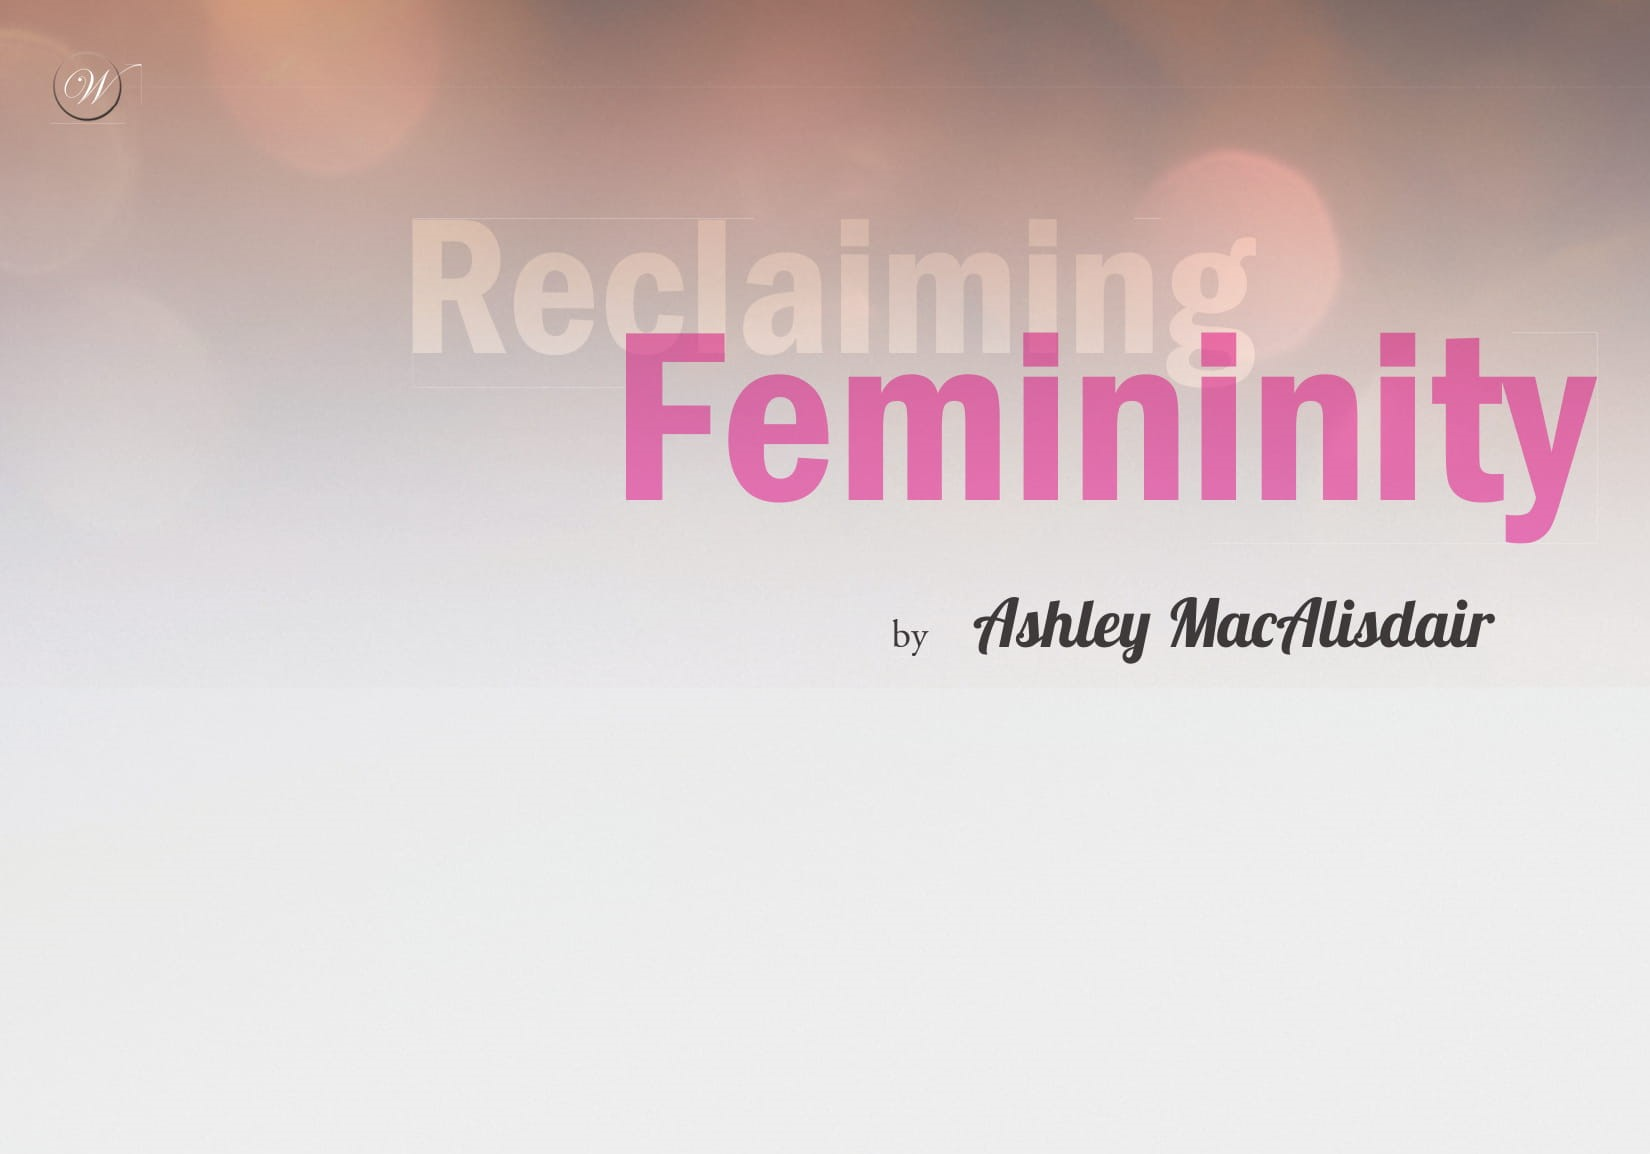 Reclaiming Femininity